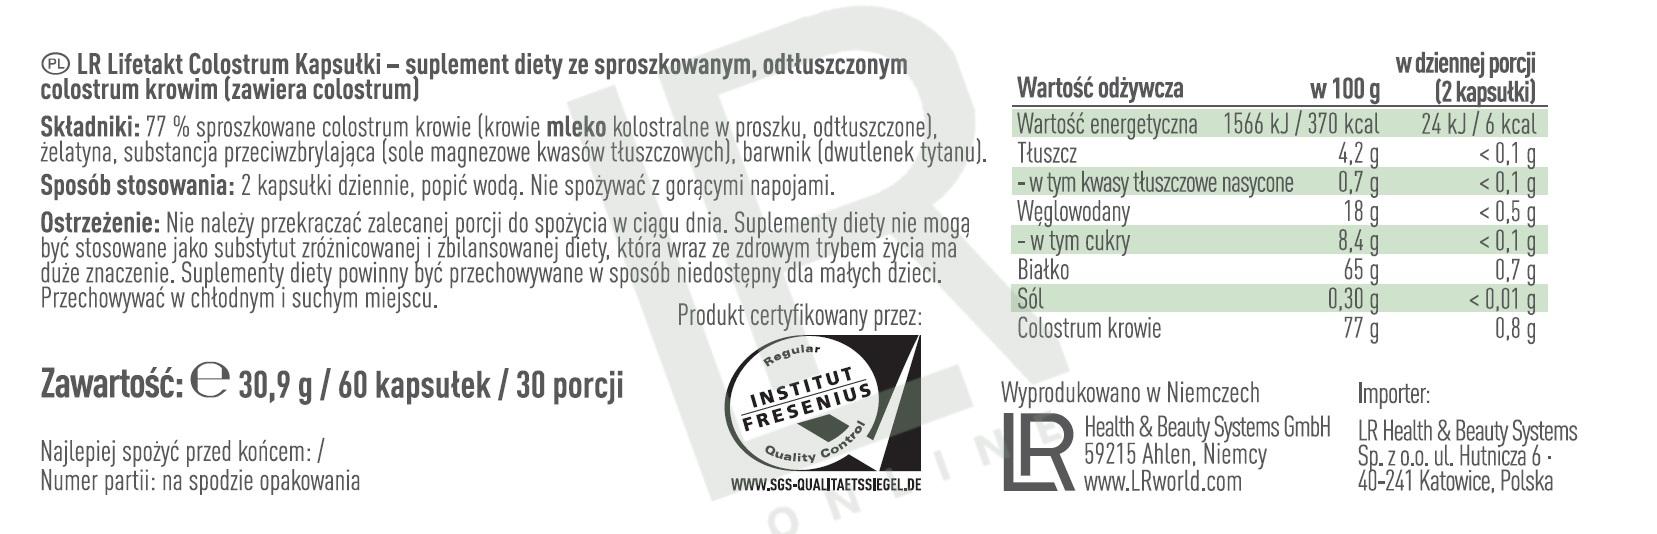 Etykieta Produktu